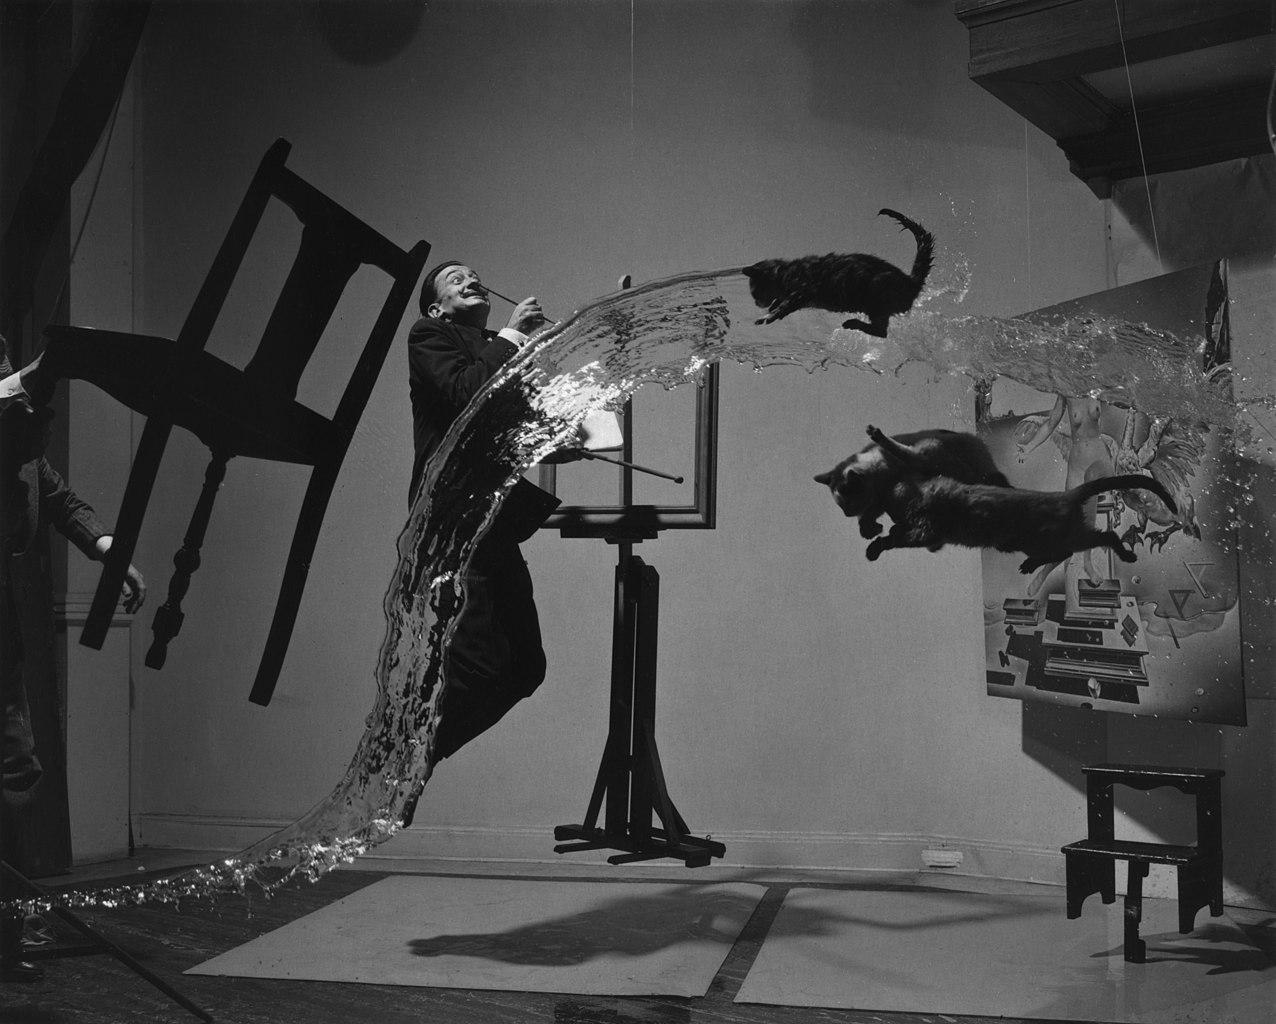 Филипп Халсман, Дали Атомикус, 1948